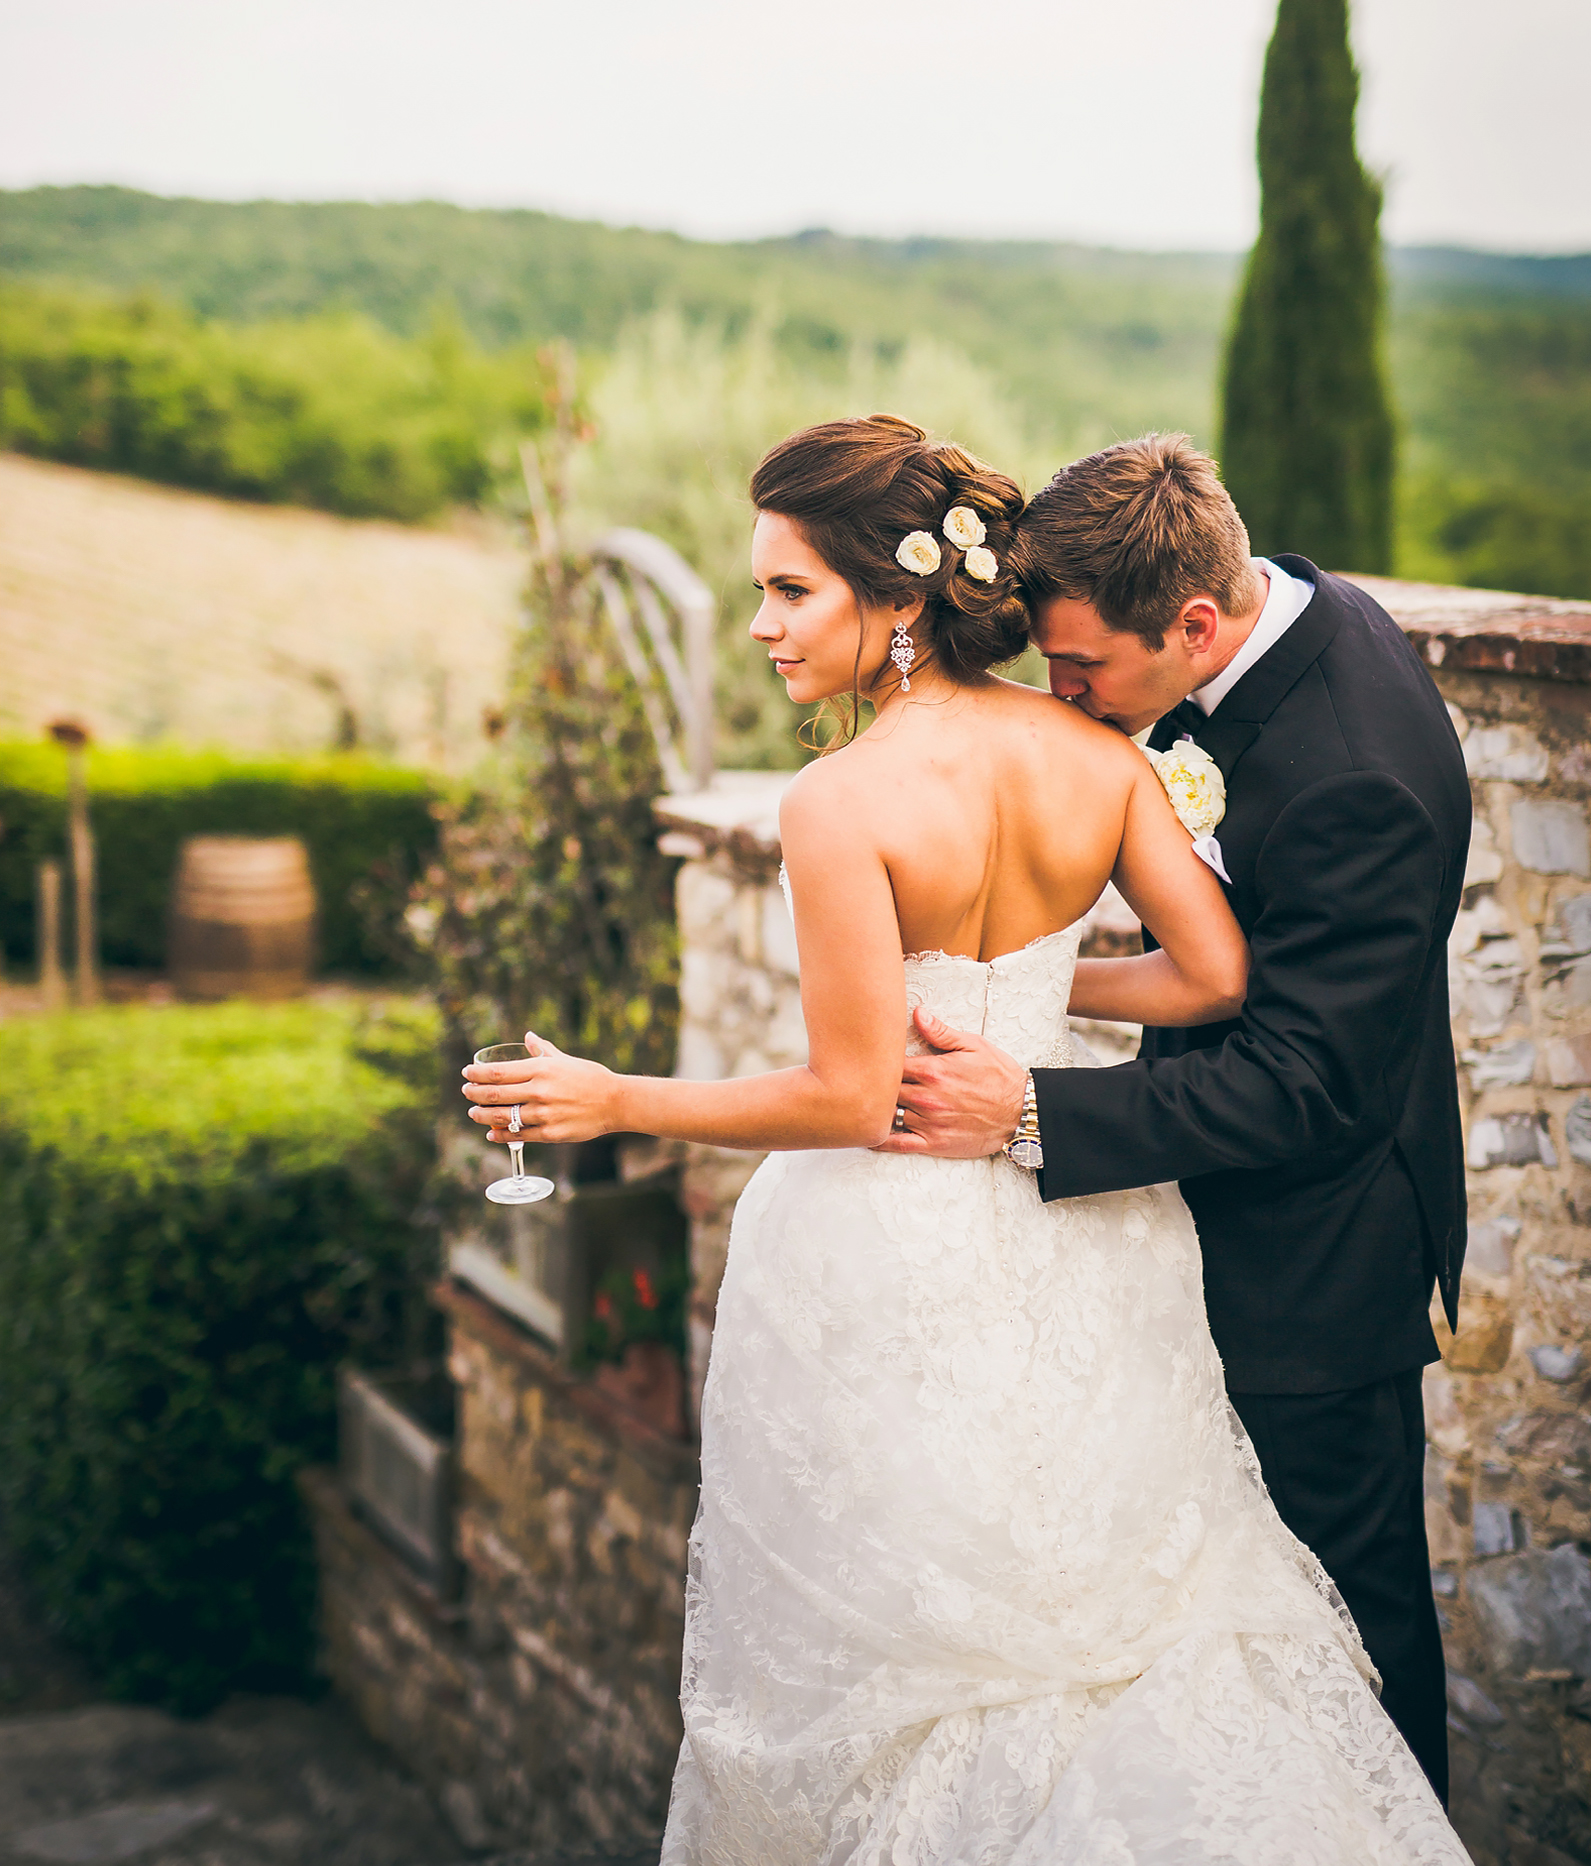 Italy Destination Wedding Photography // Marissa + Jeremy